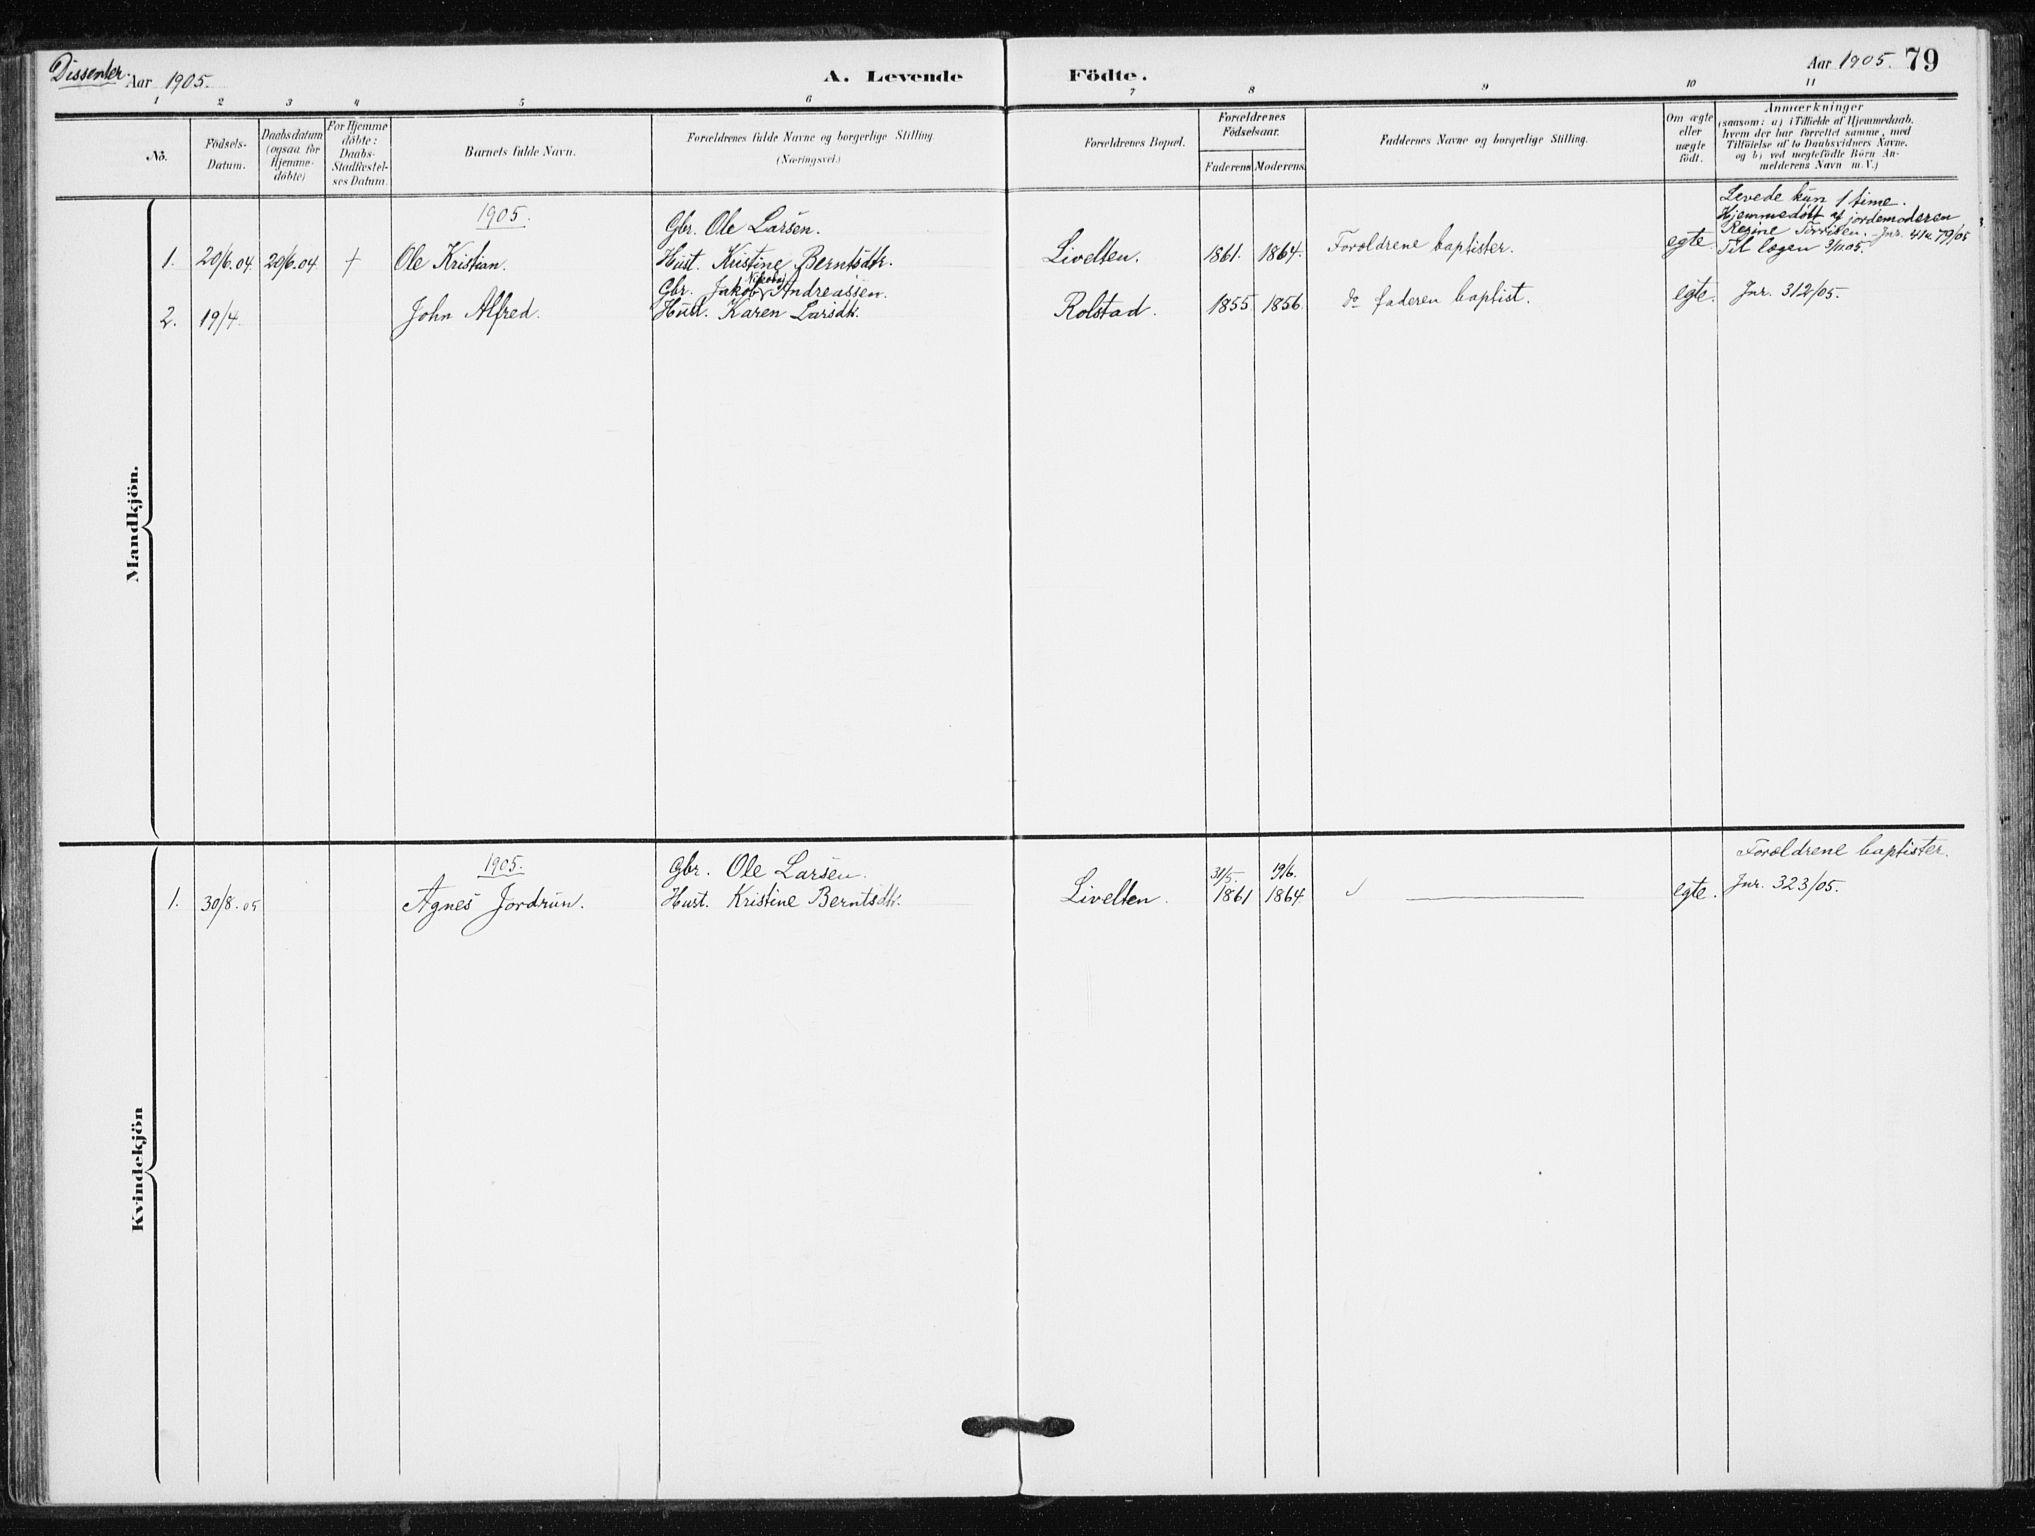 SATØ, Målselv sokneprestembete, Ministerialbok nr. 13, 1903-1919, s. 79